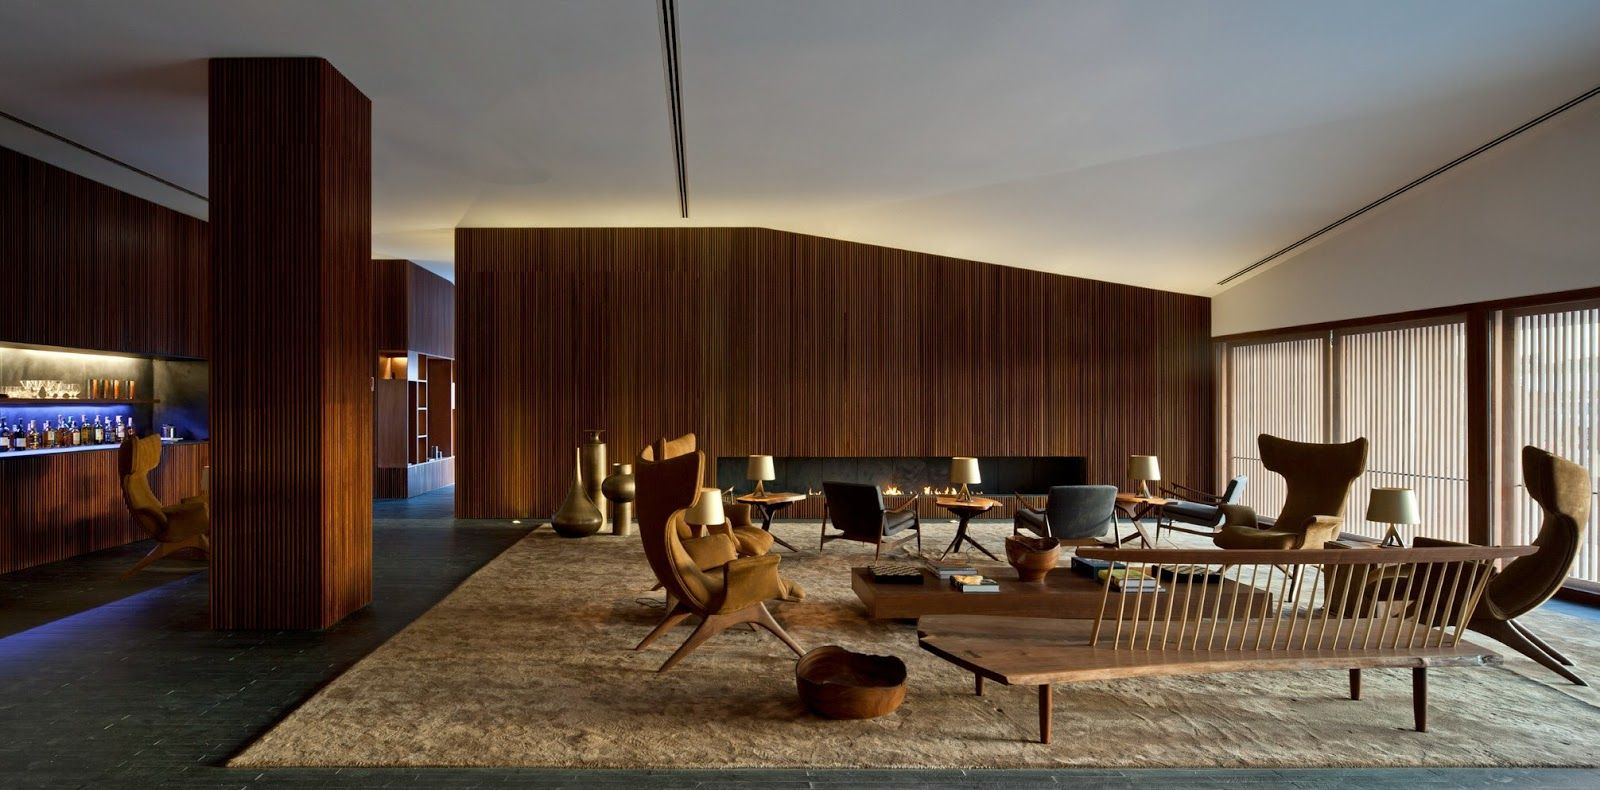 Yellow And Wood Lounge Design Hotel Interiors Interior